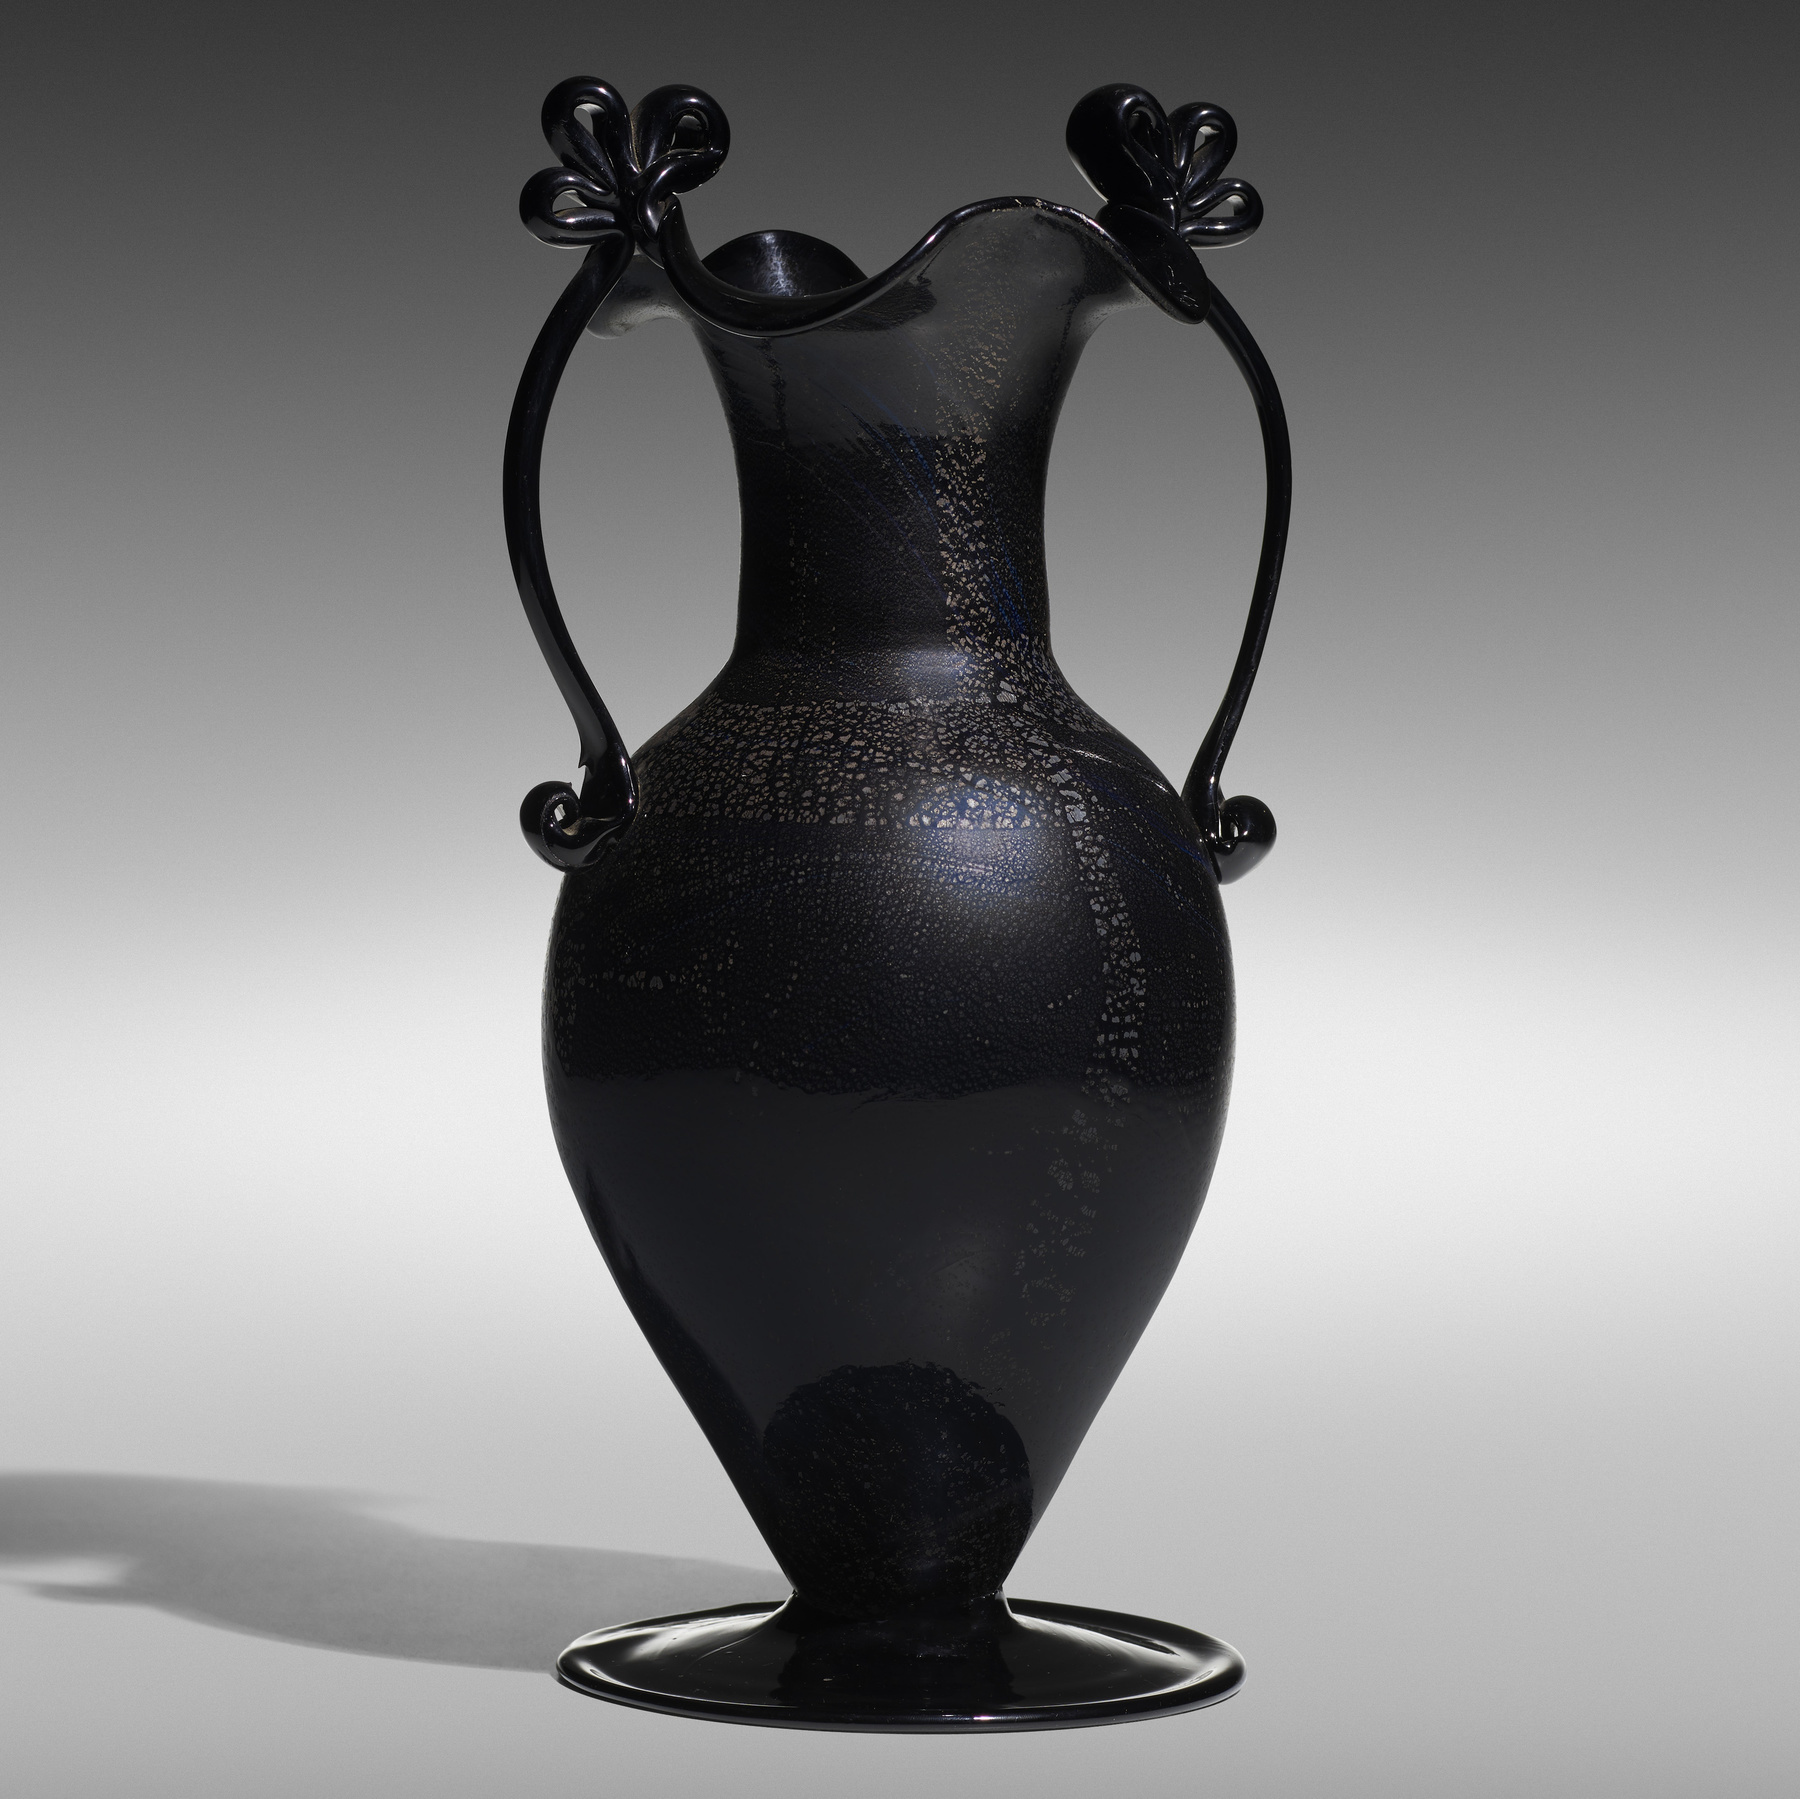 135 1 Important Italian Glass April 2020 Fratelli Toso Nero Argento Vase Wright Auction